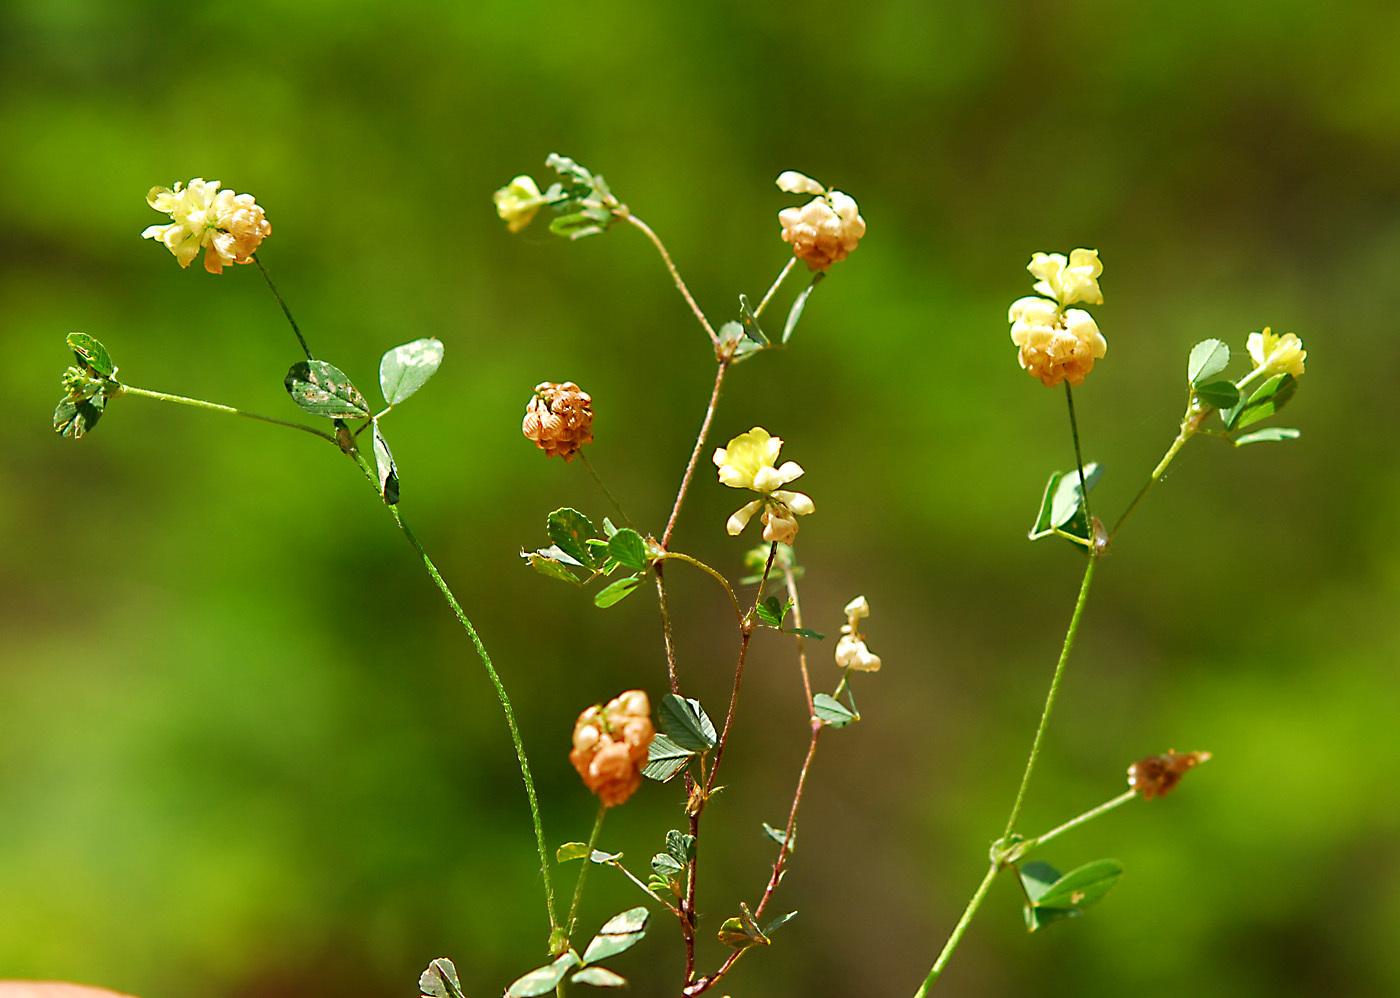 https://pictures.bgbm.org/digilib/Scaler?fn=Cyprus/Trifolium_dubium_A1.jpg&mo=file